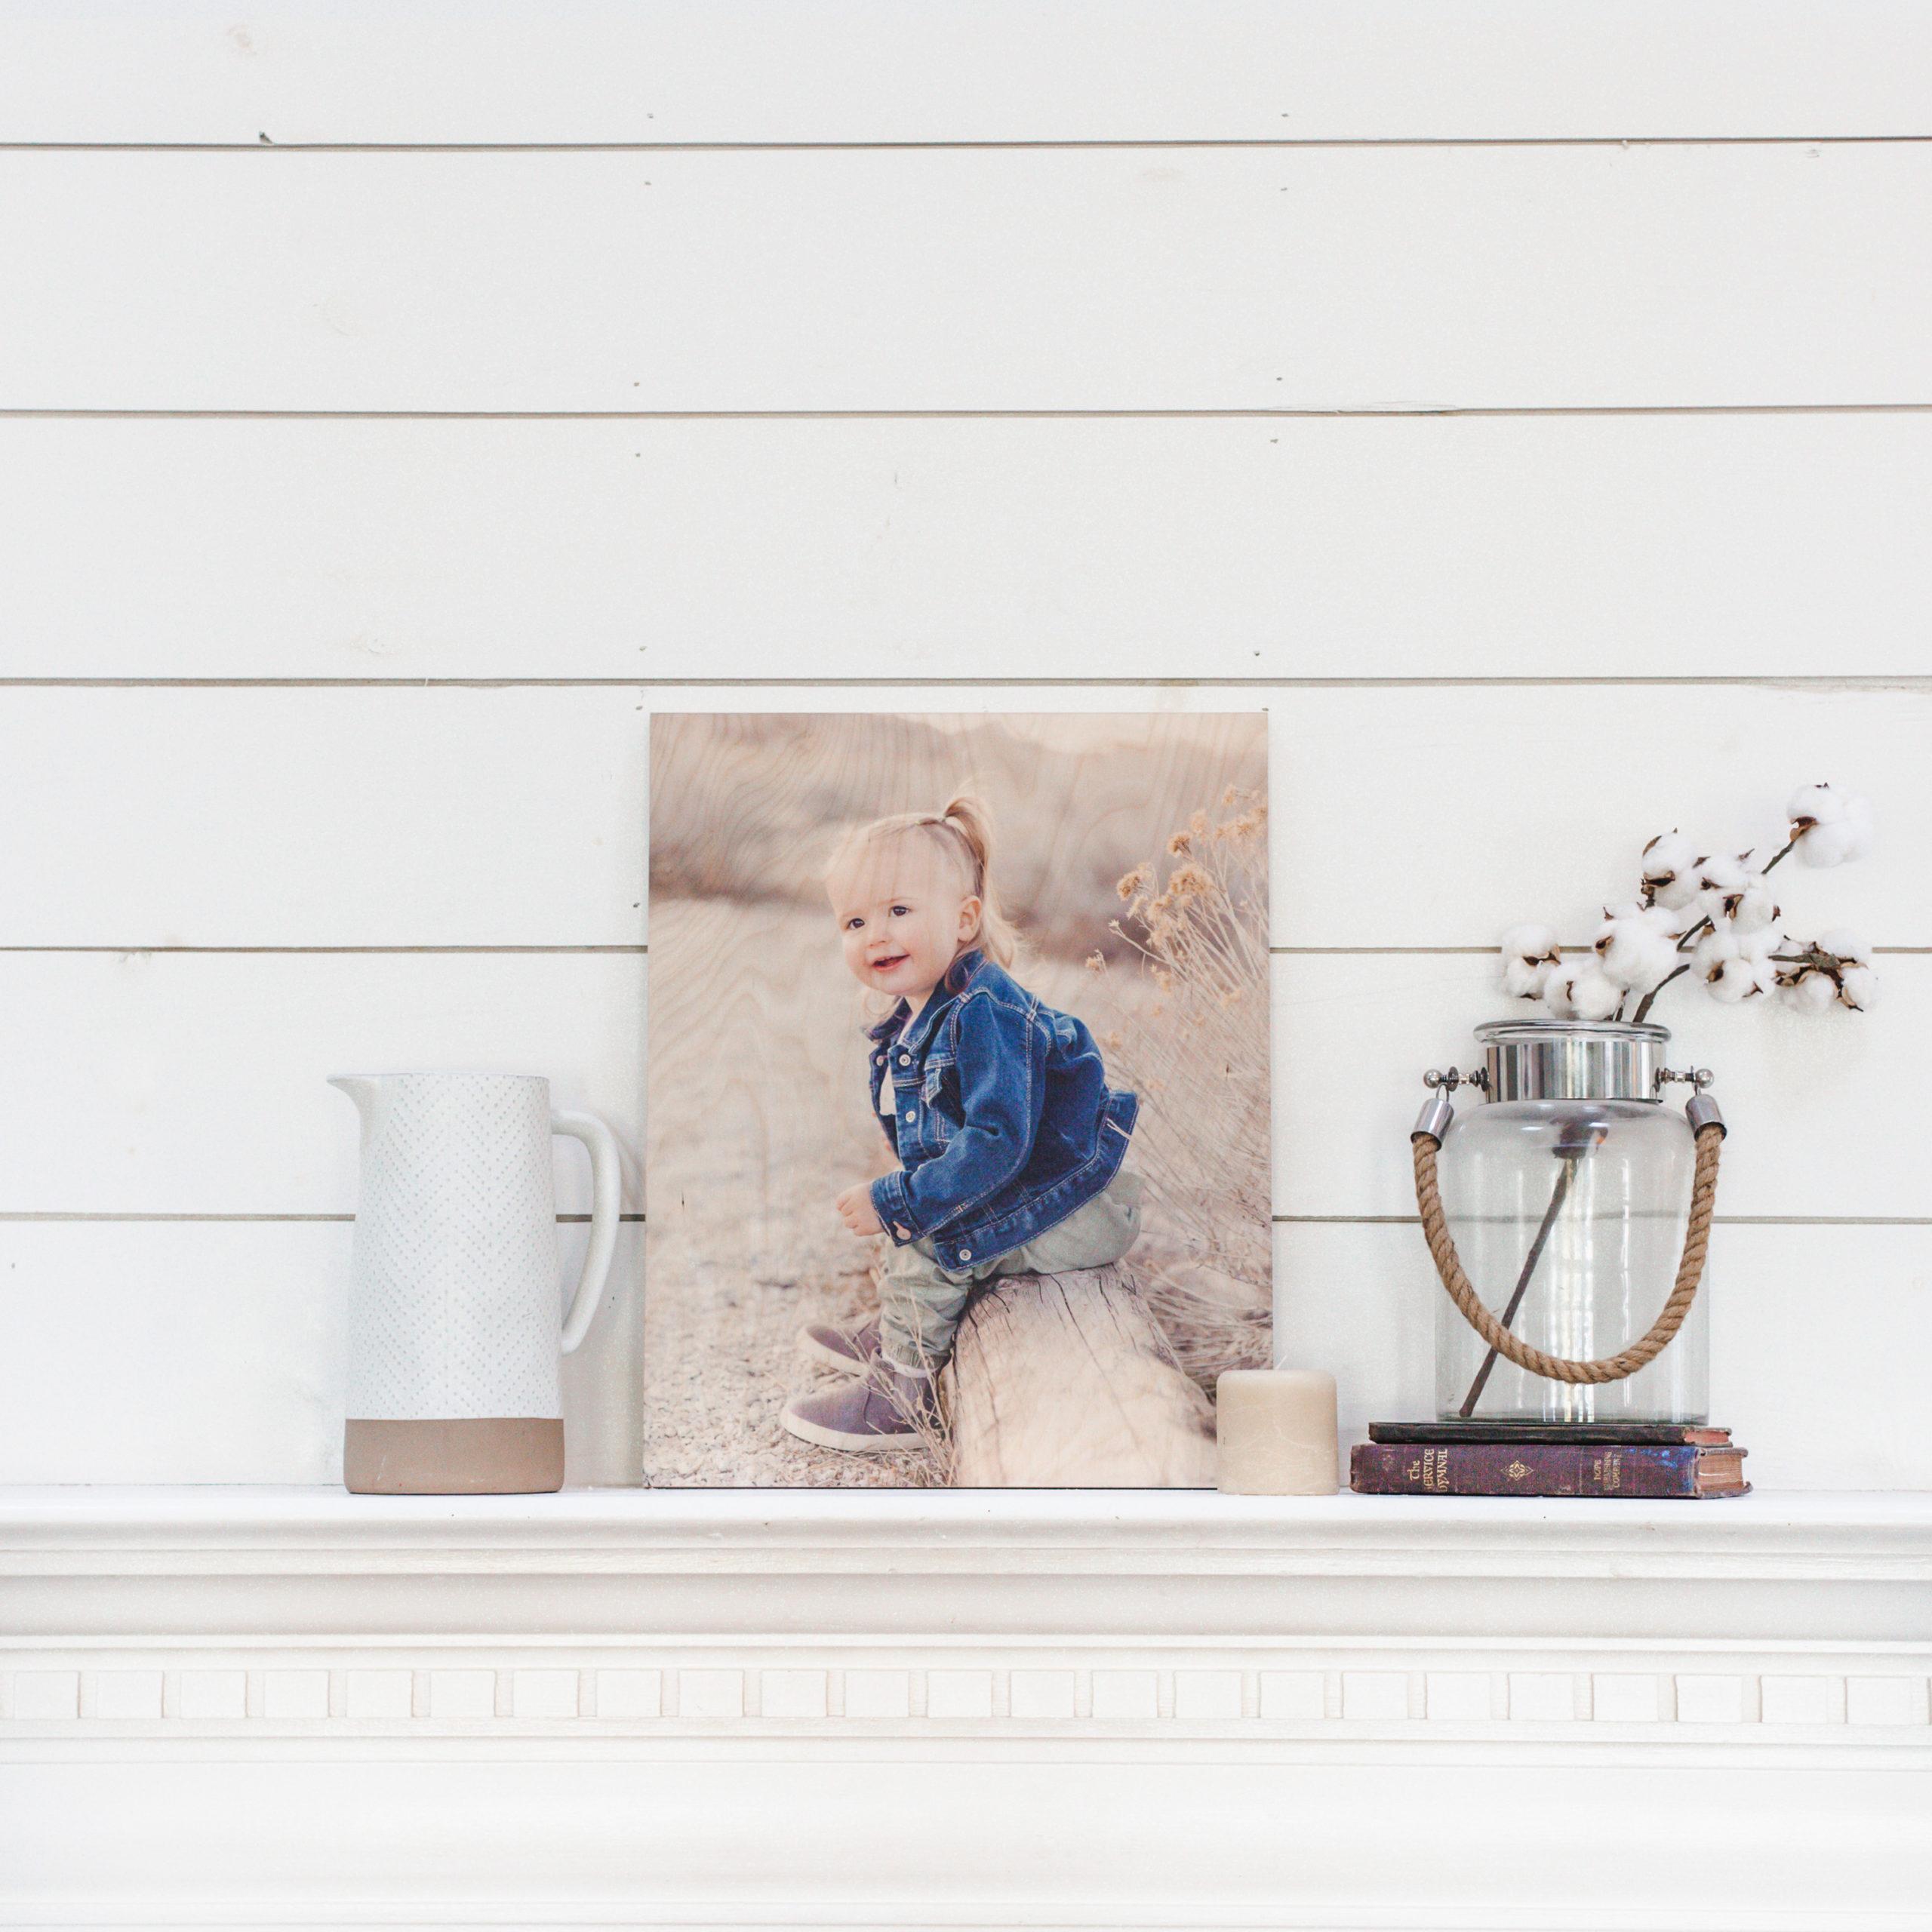 "16x20 Burlap Gallery Wraps (.75"") | $35 ($115)"